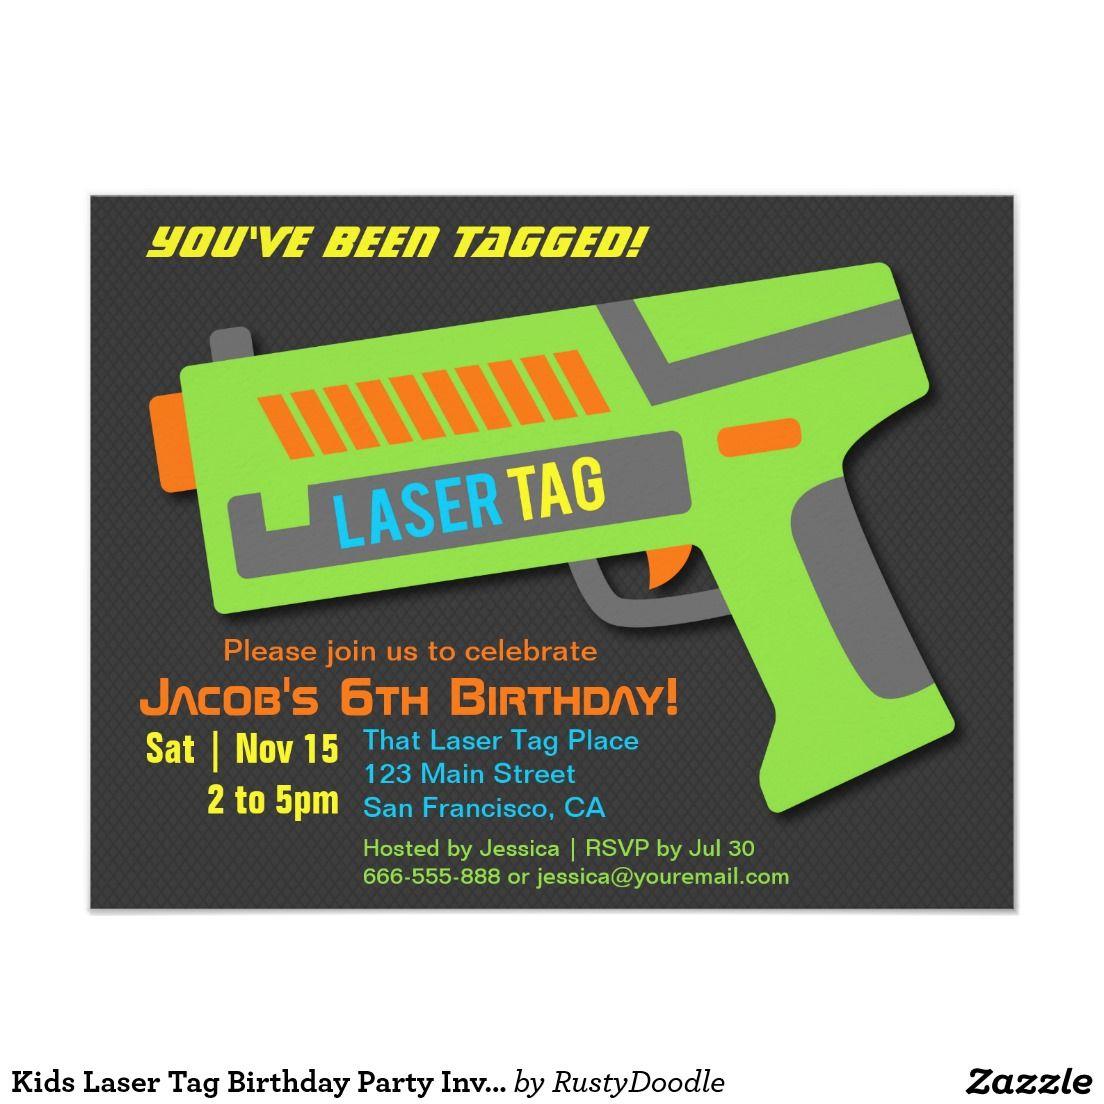 Kids Laser Tag Birthday Party Invitations | Birthday - Laser Tag ...